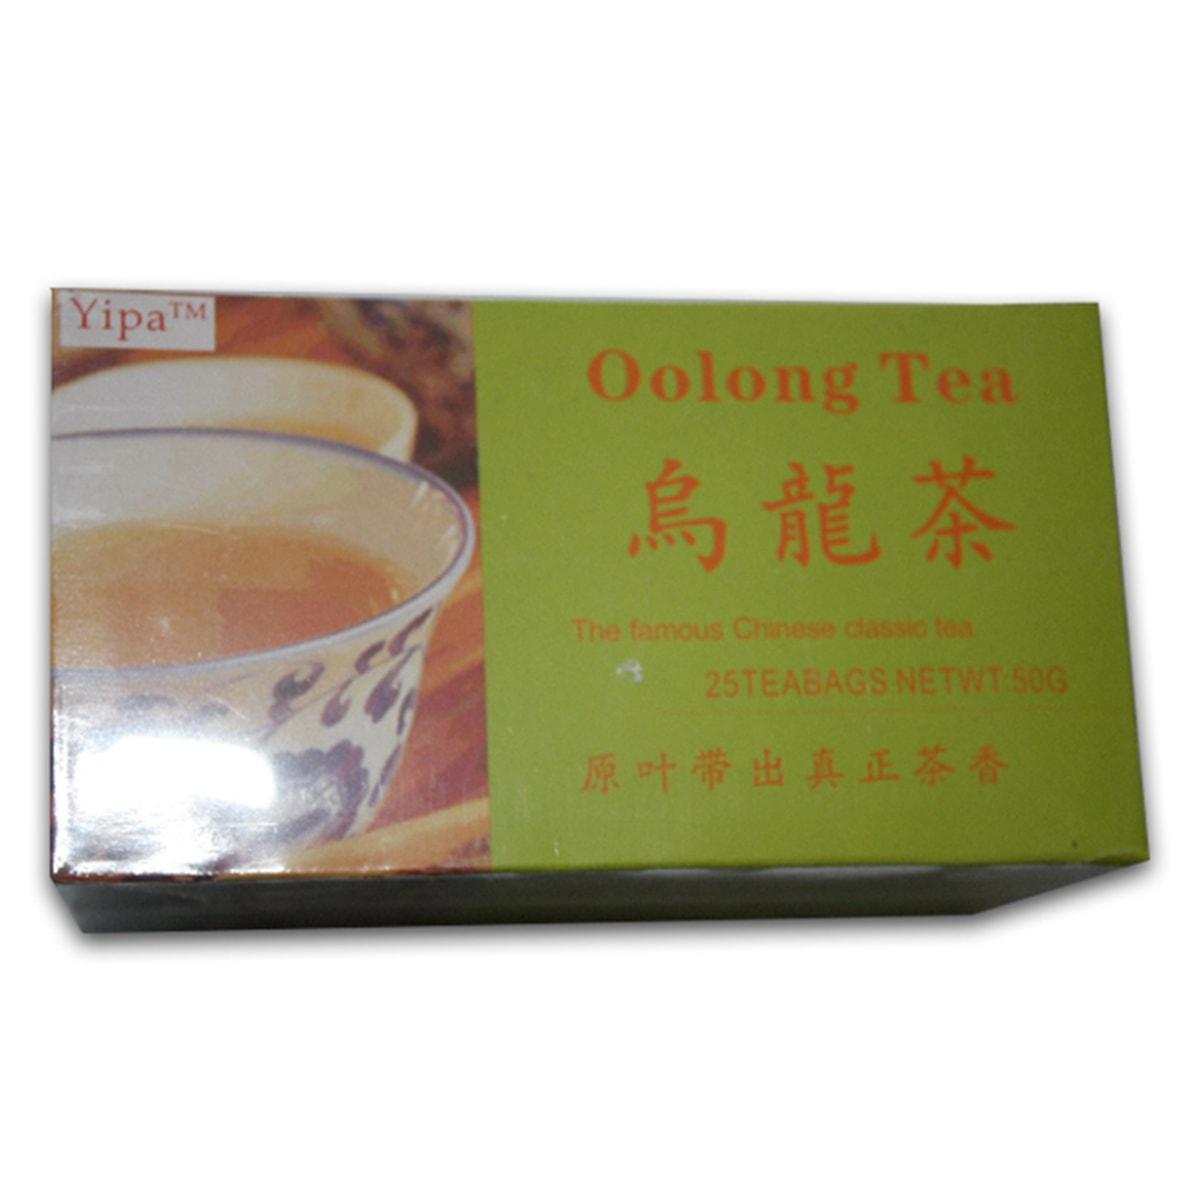 Buy Yipa Oolong Tea (25 Teabags) - 50 gm